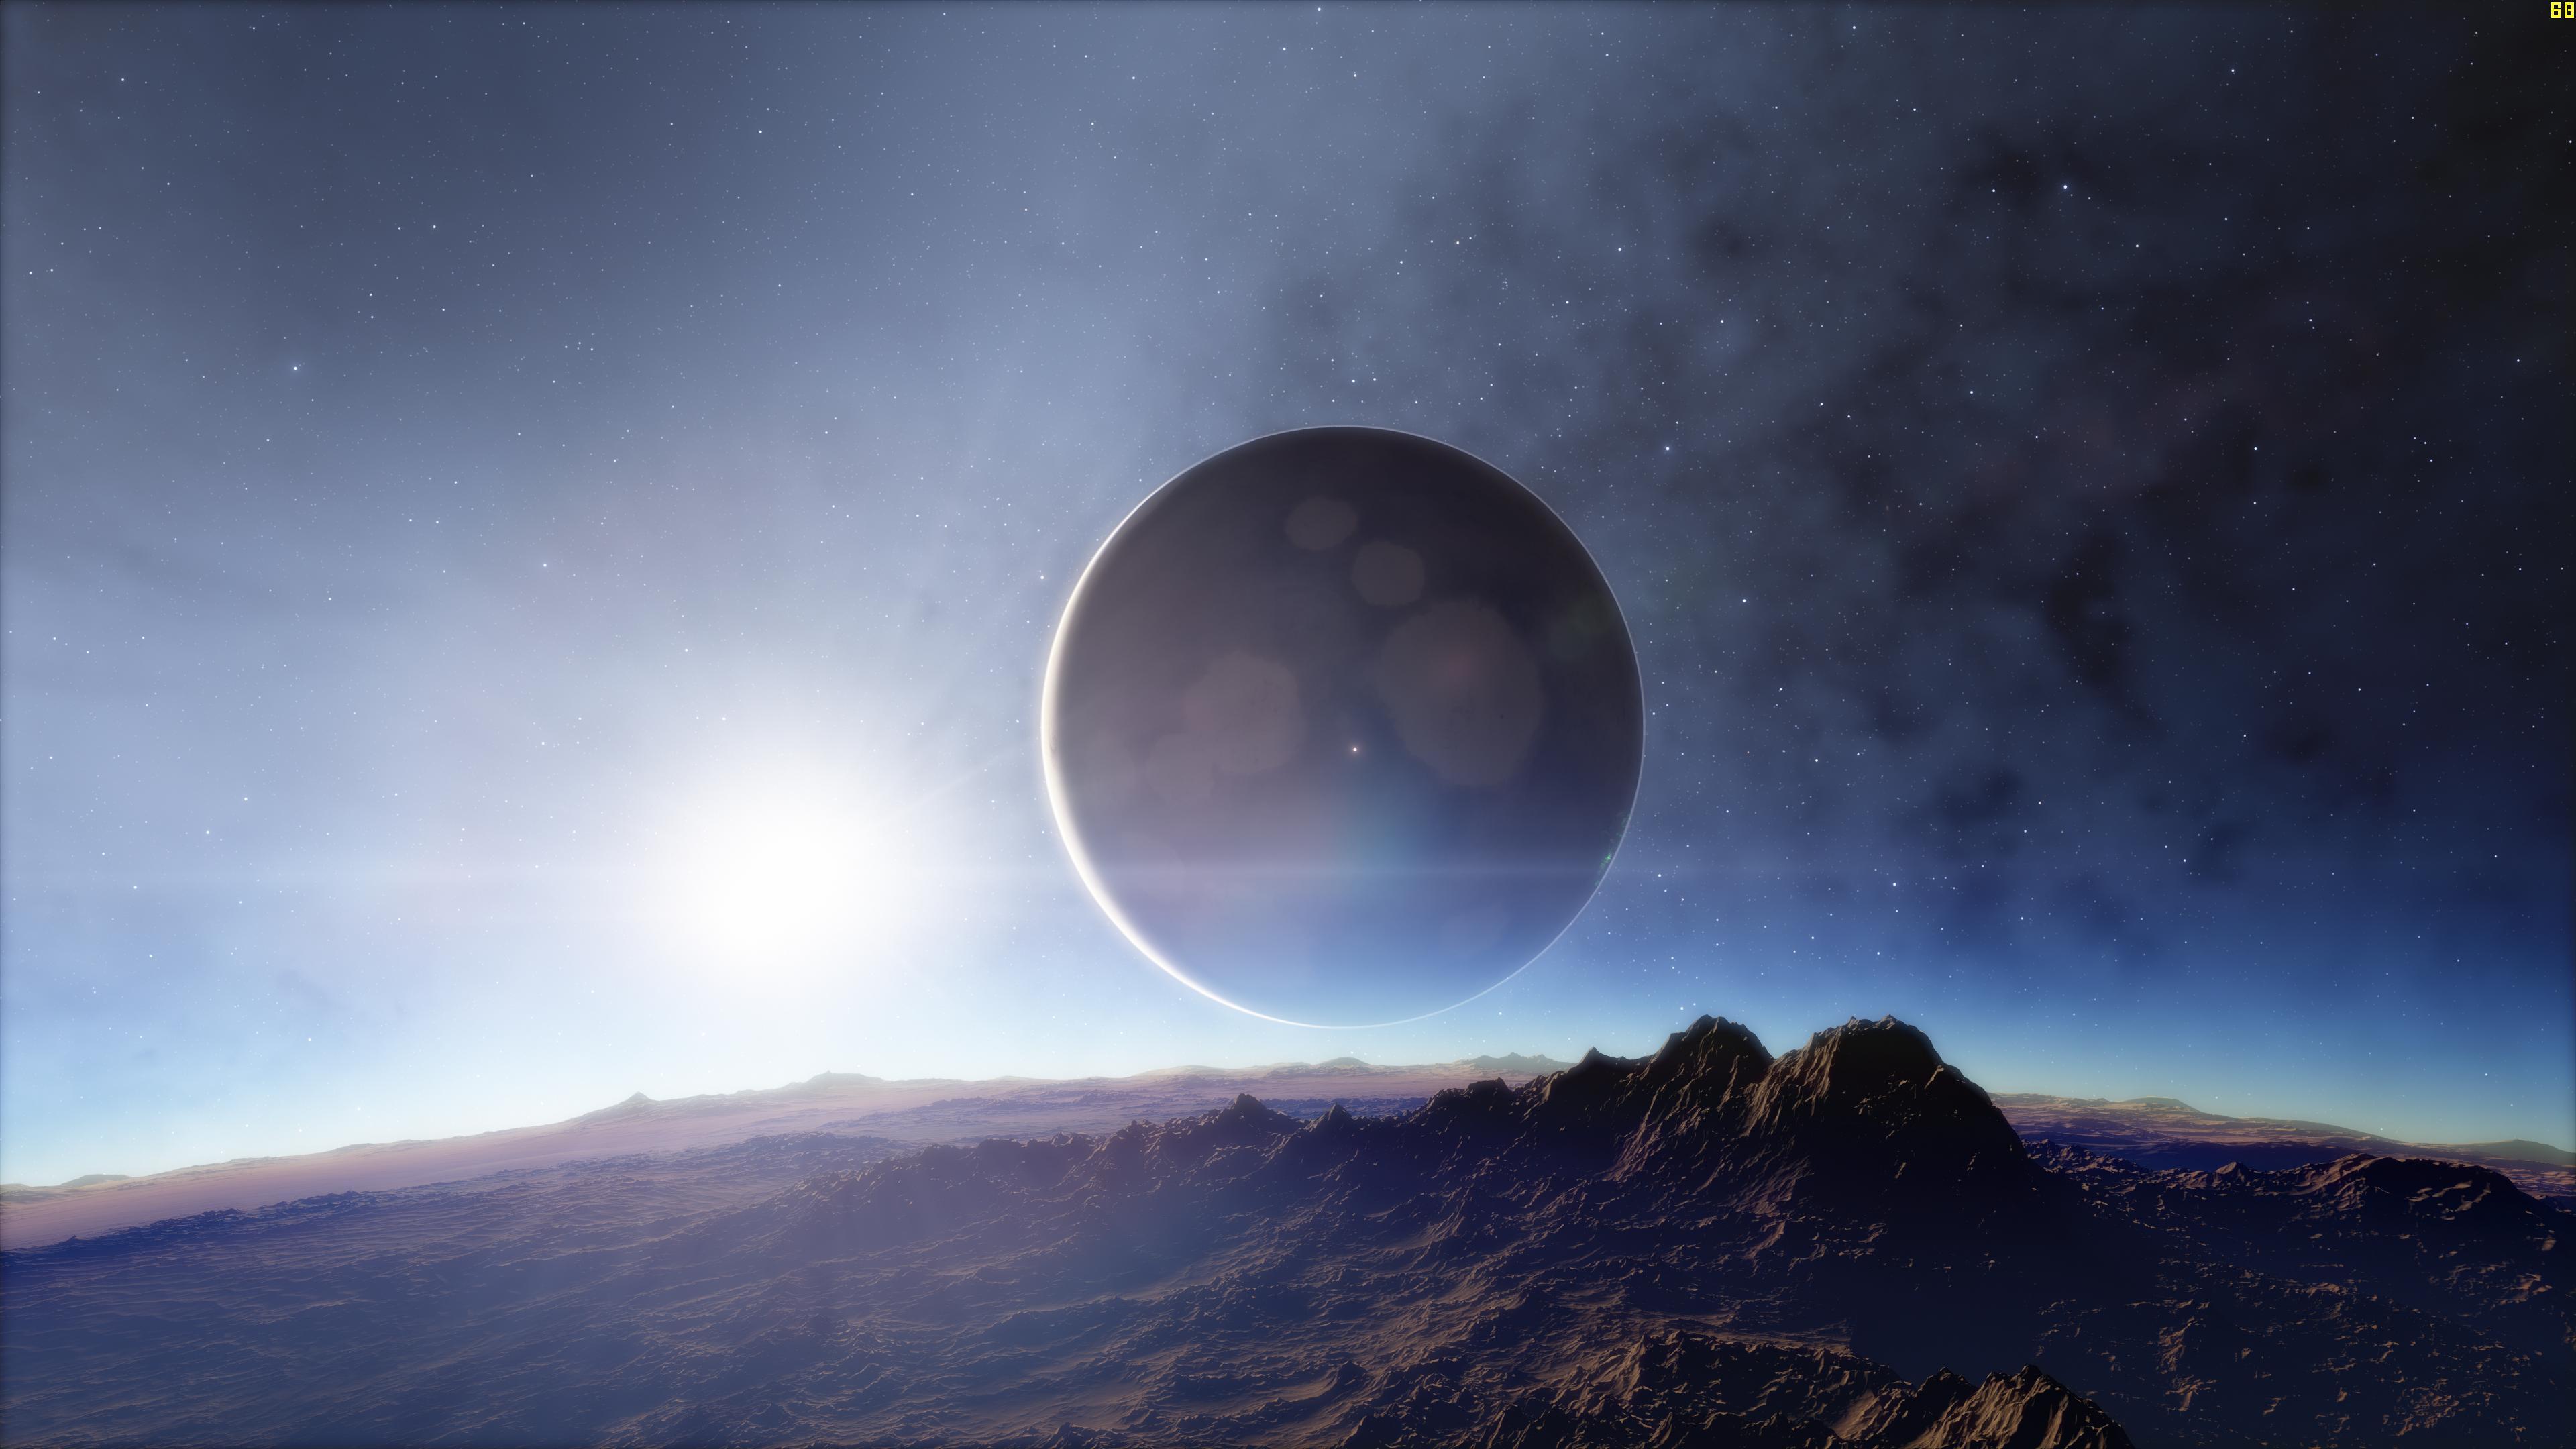 Huge moon orbiting a planet 4k ultra fondo de pantalla hd - Space wallpaper large ...